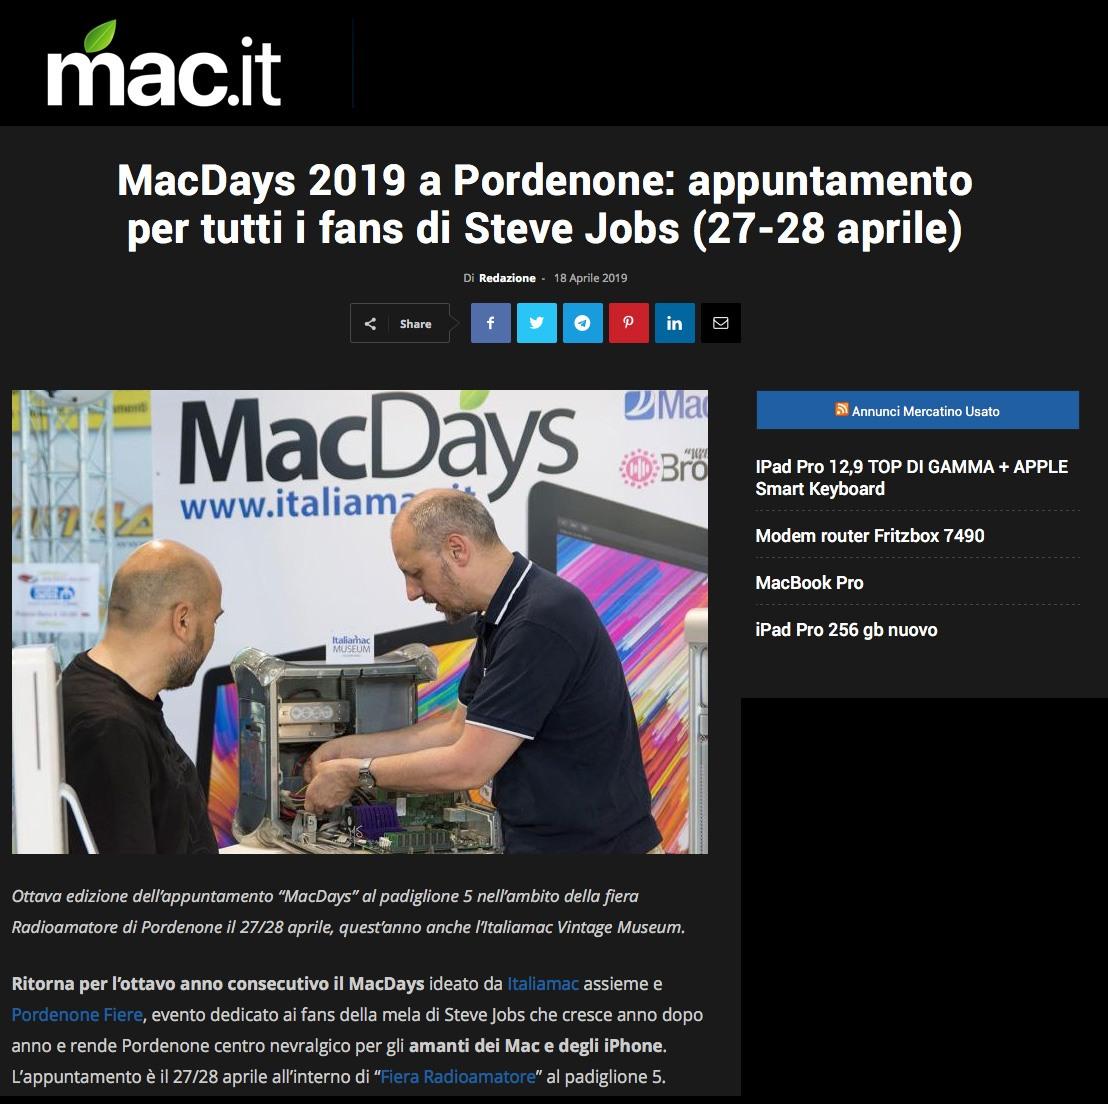 mac it 15042019 Rassegna Stampa Radioamatore Fiera 2019